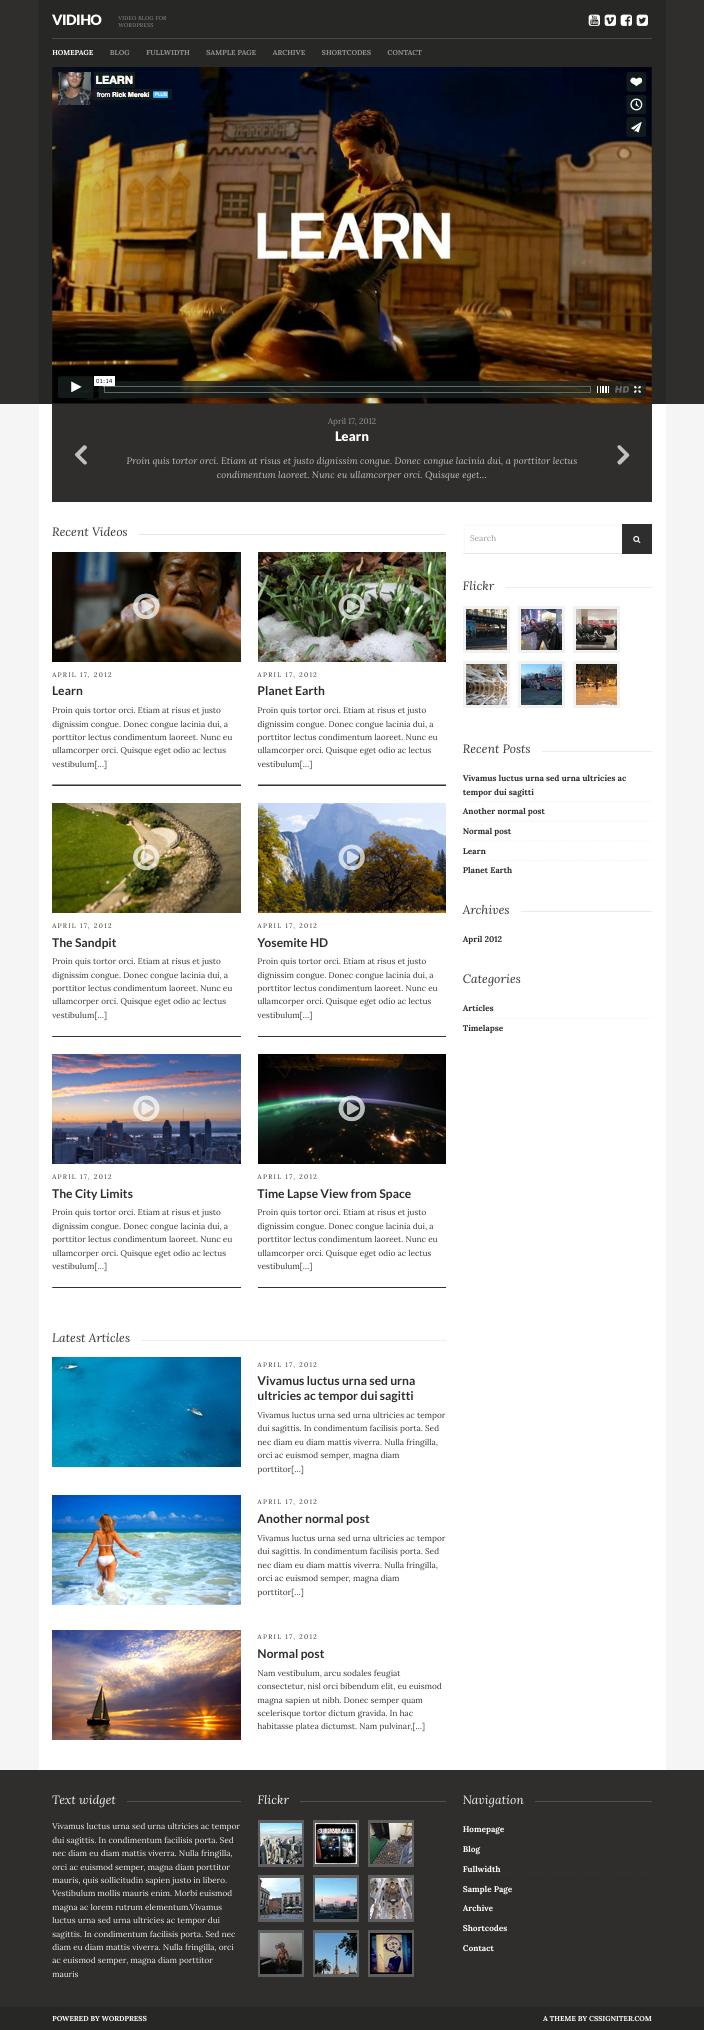 Vidiho Theme for Video Blogging & High Definition slider